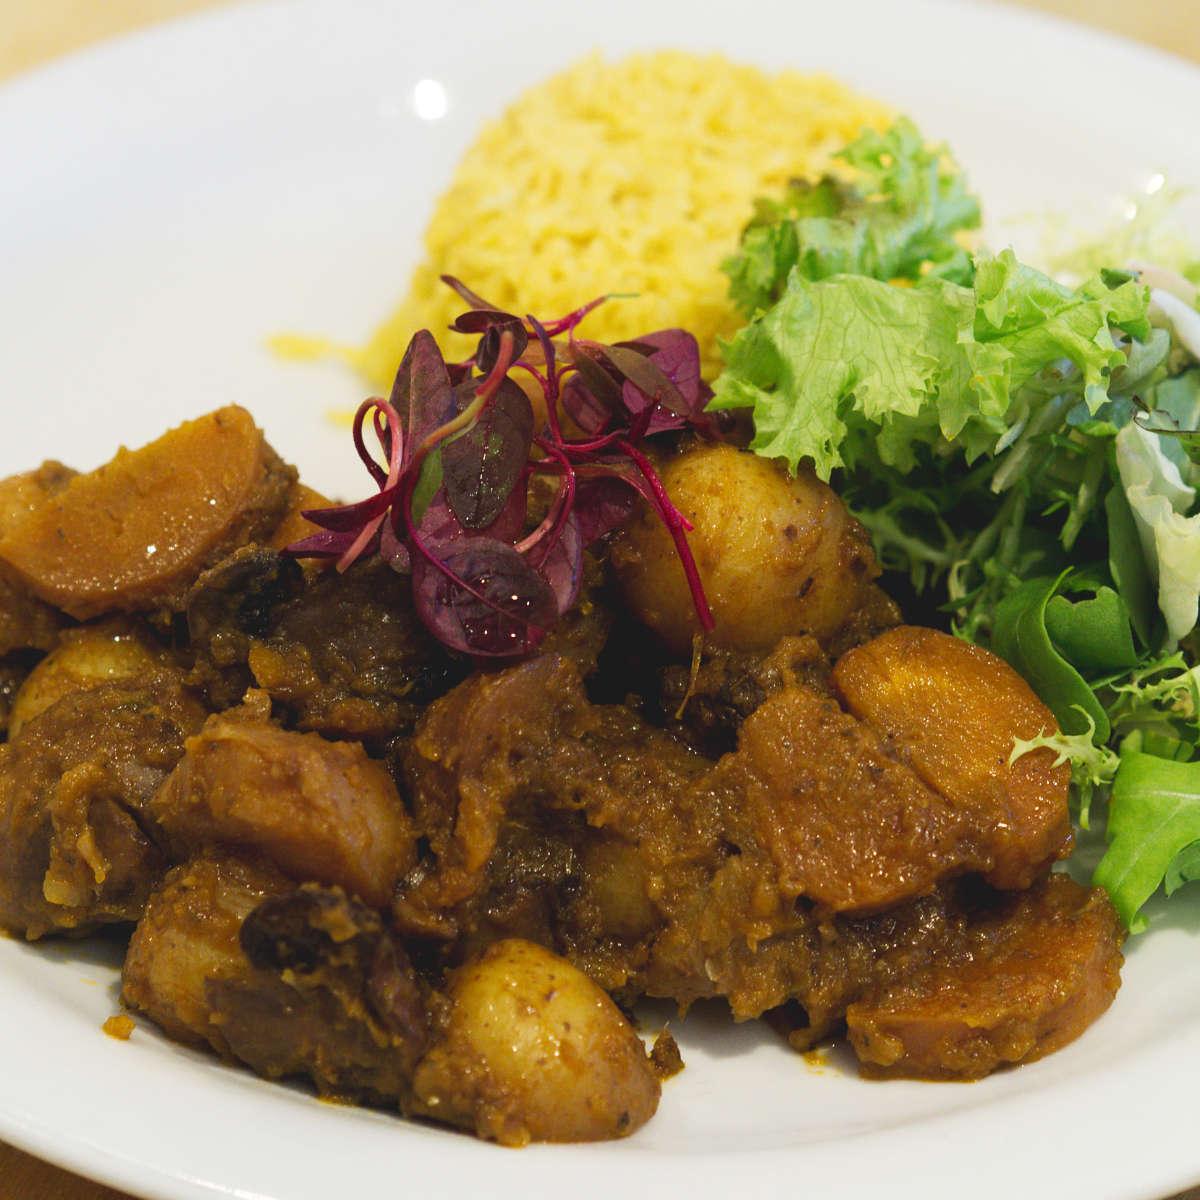 Vegan potato and mushroom stew at Hendersons Edinburgh